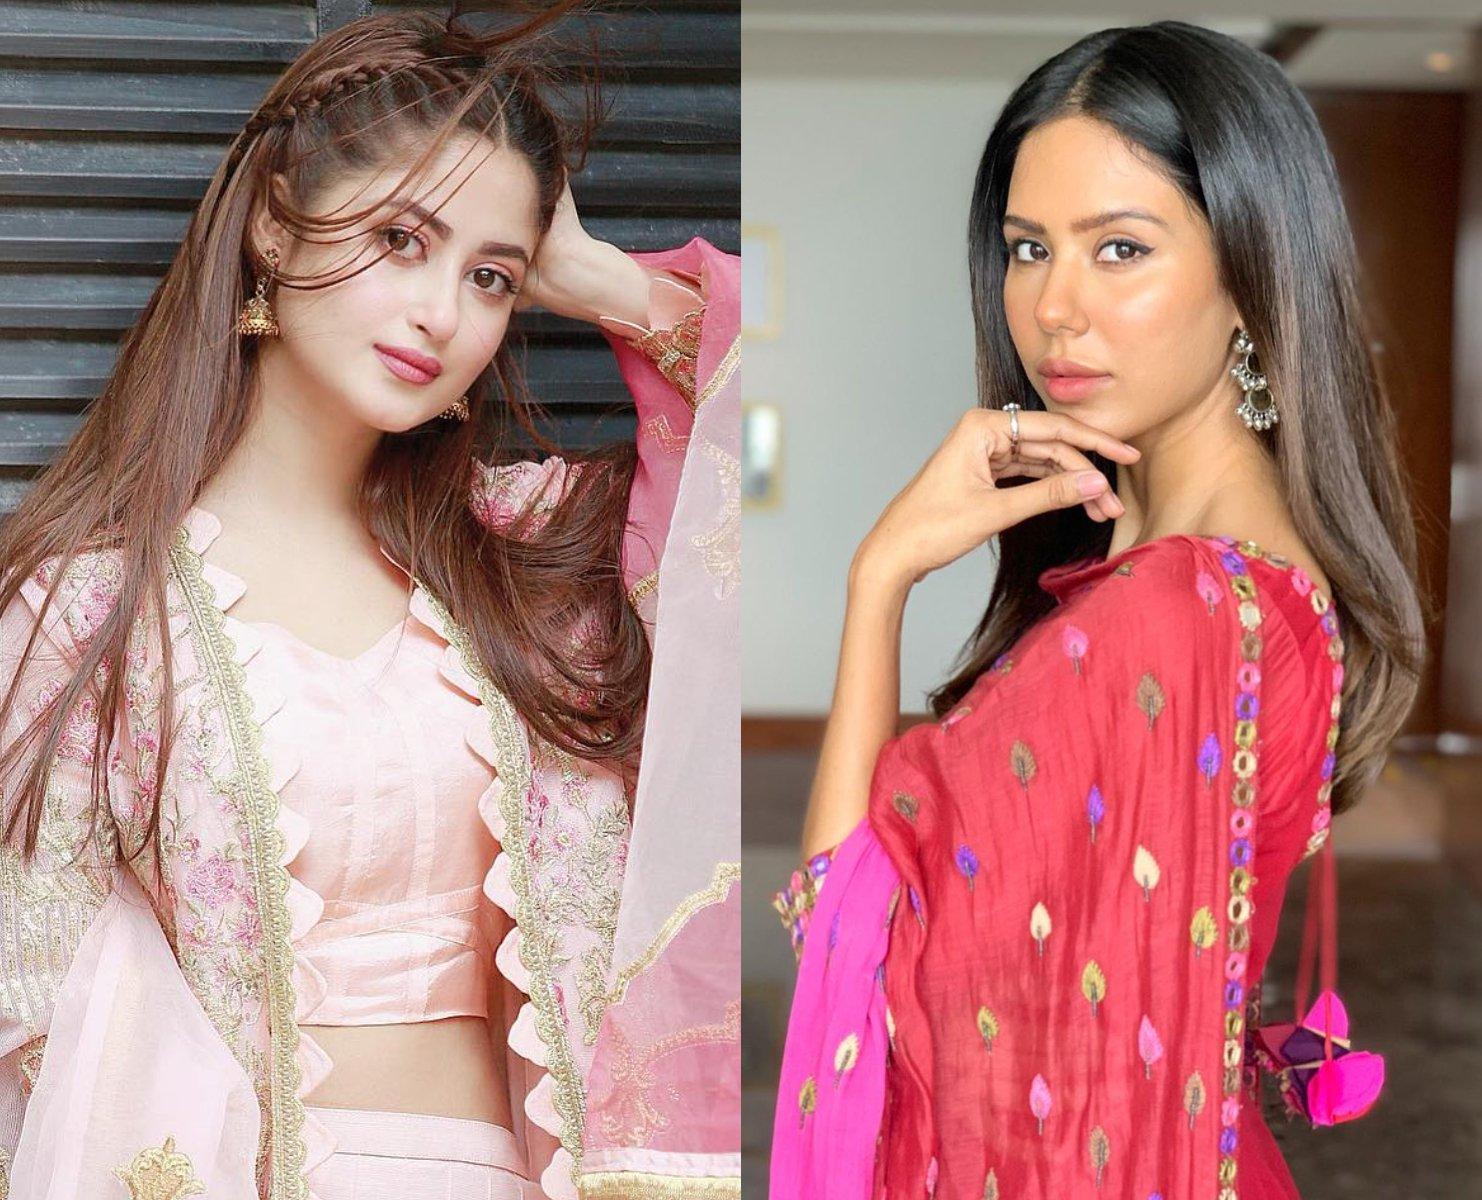 indian model sonam bajwa believes sajal aly is a fine actor